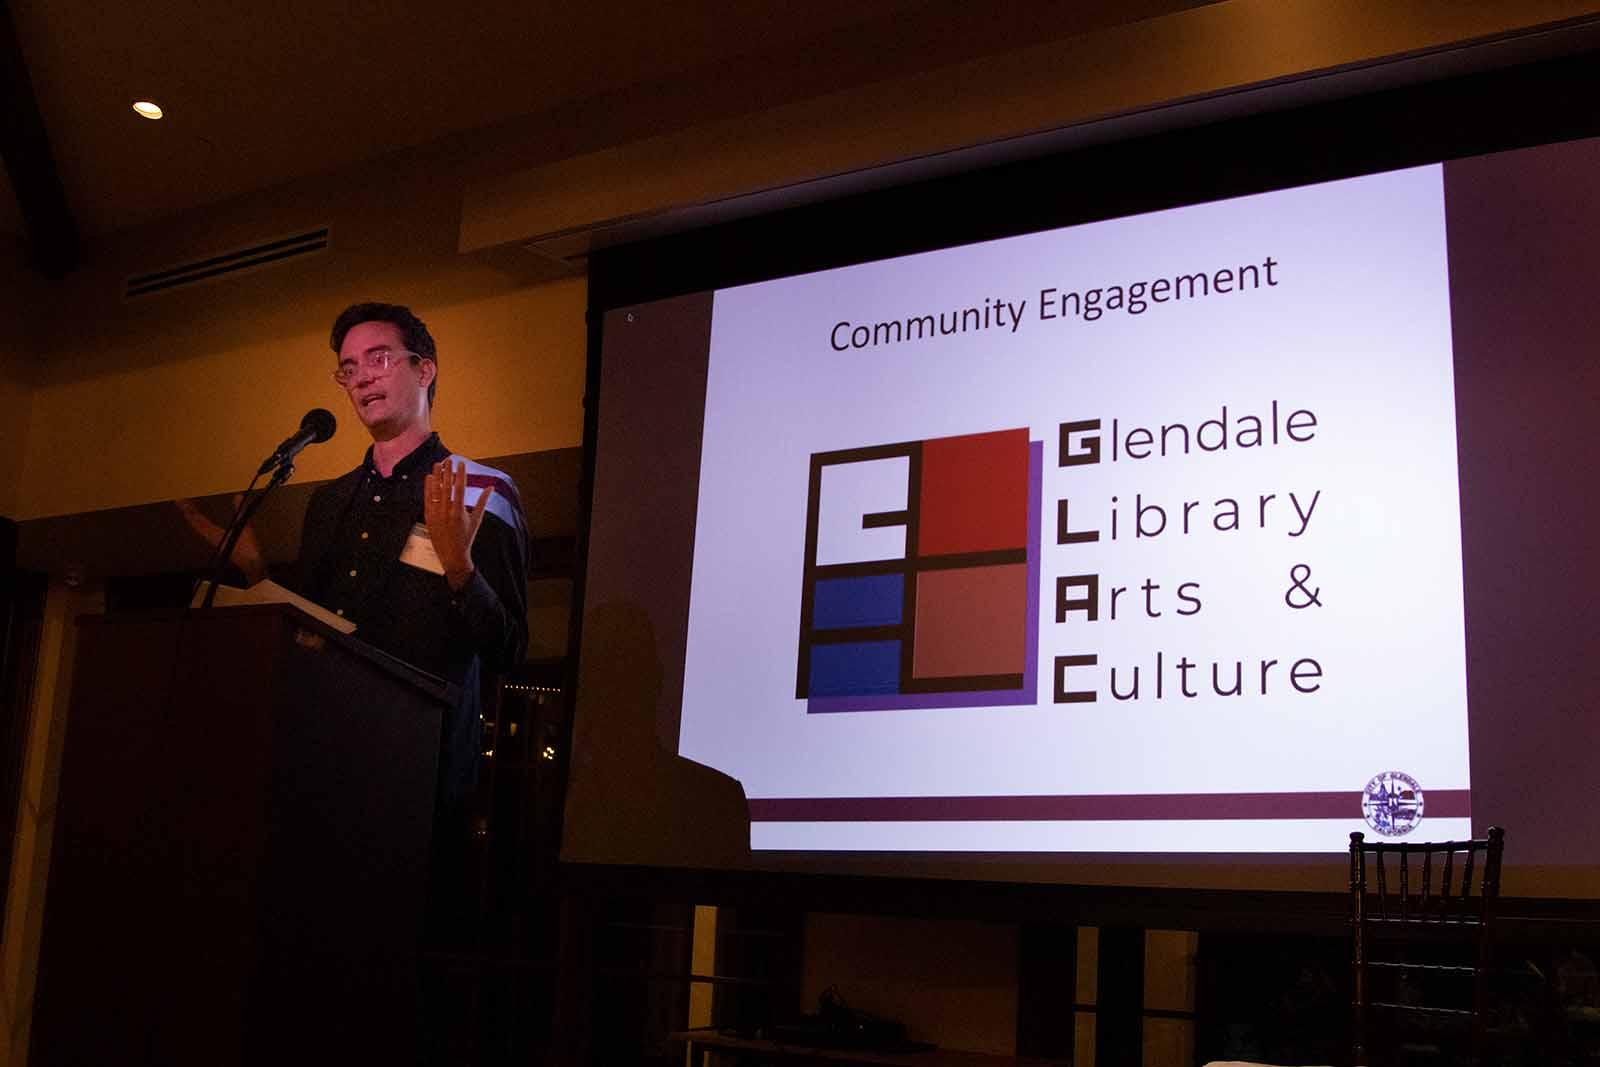 Glendale Library Community Engagement